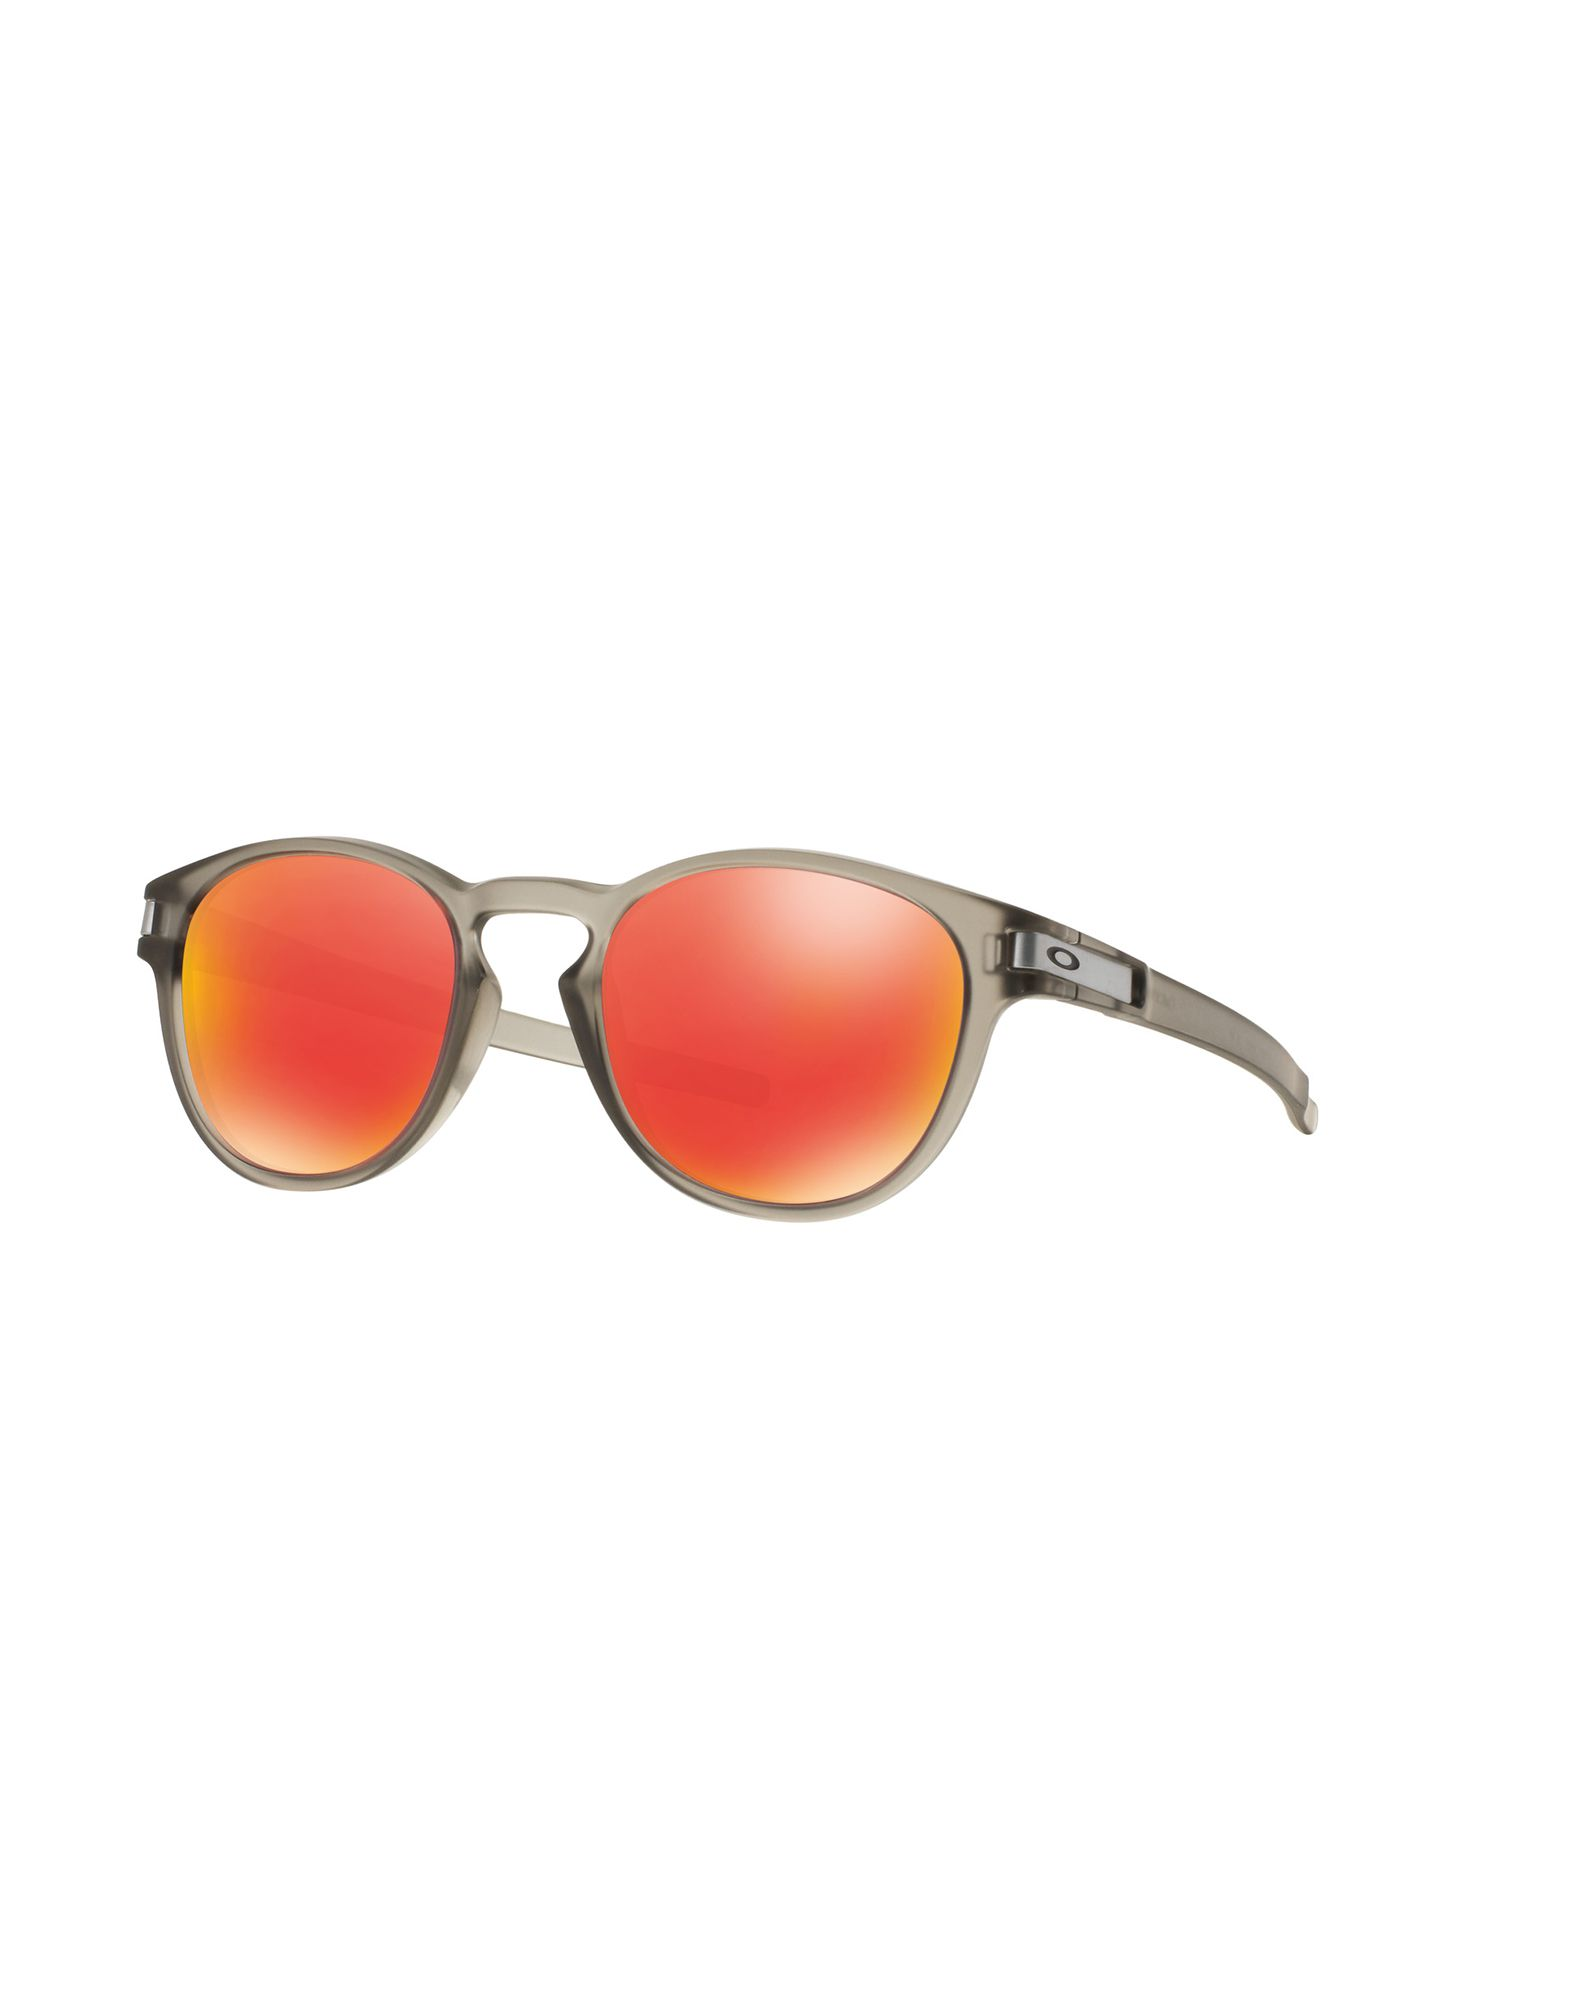 OAKLEY Солнечные очки очки oakley frogskin lx banded green grey polarized